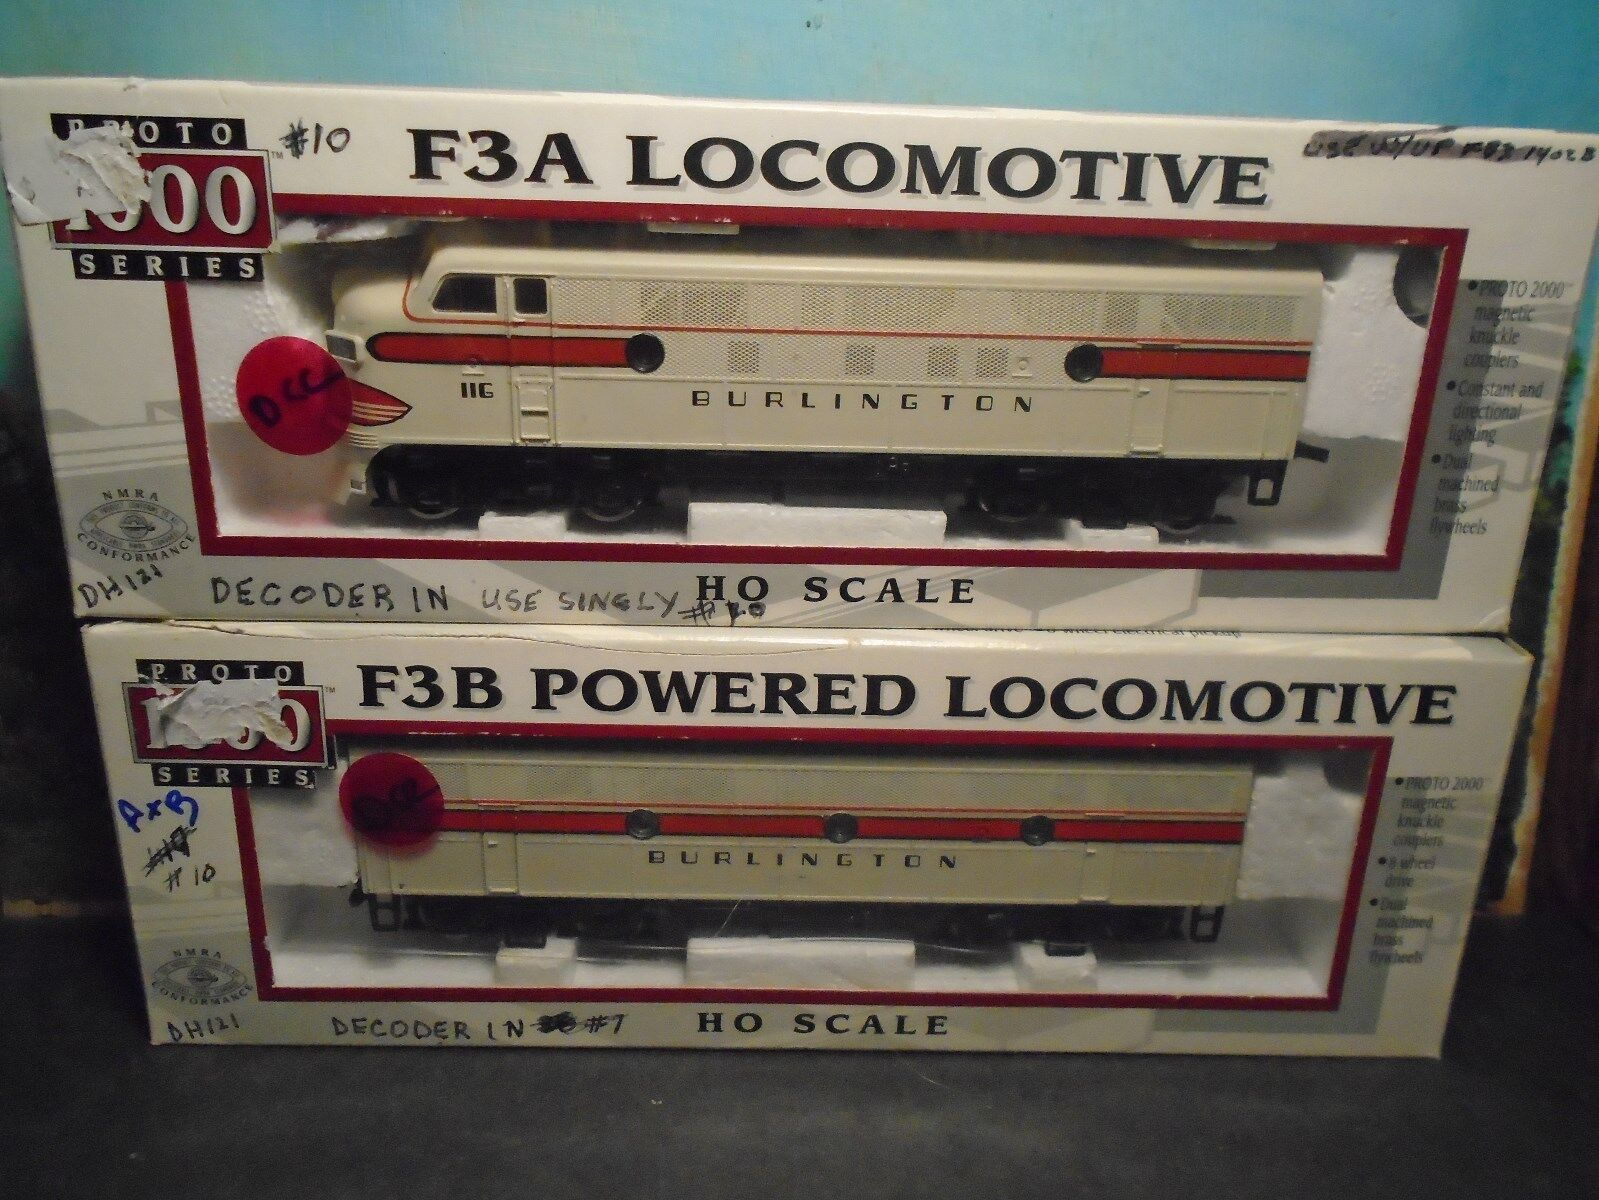 ProssoO 1000 HO SCALE  8165 23965 F3A B POWErosso BURLINGTON  116 120B  W DCC